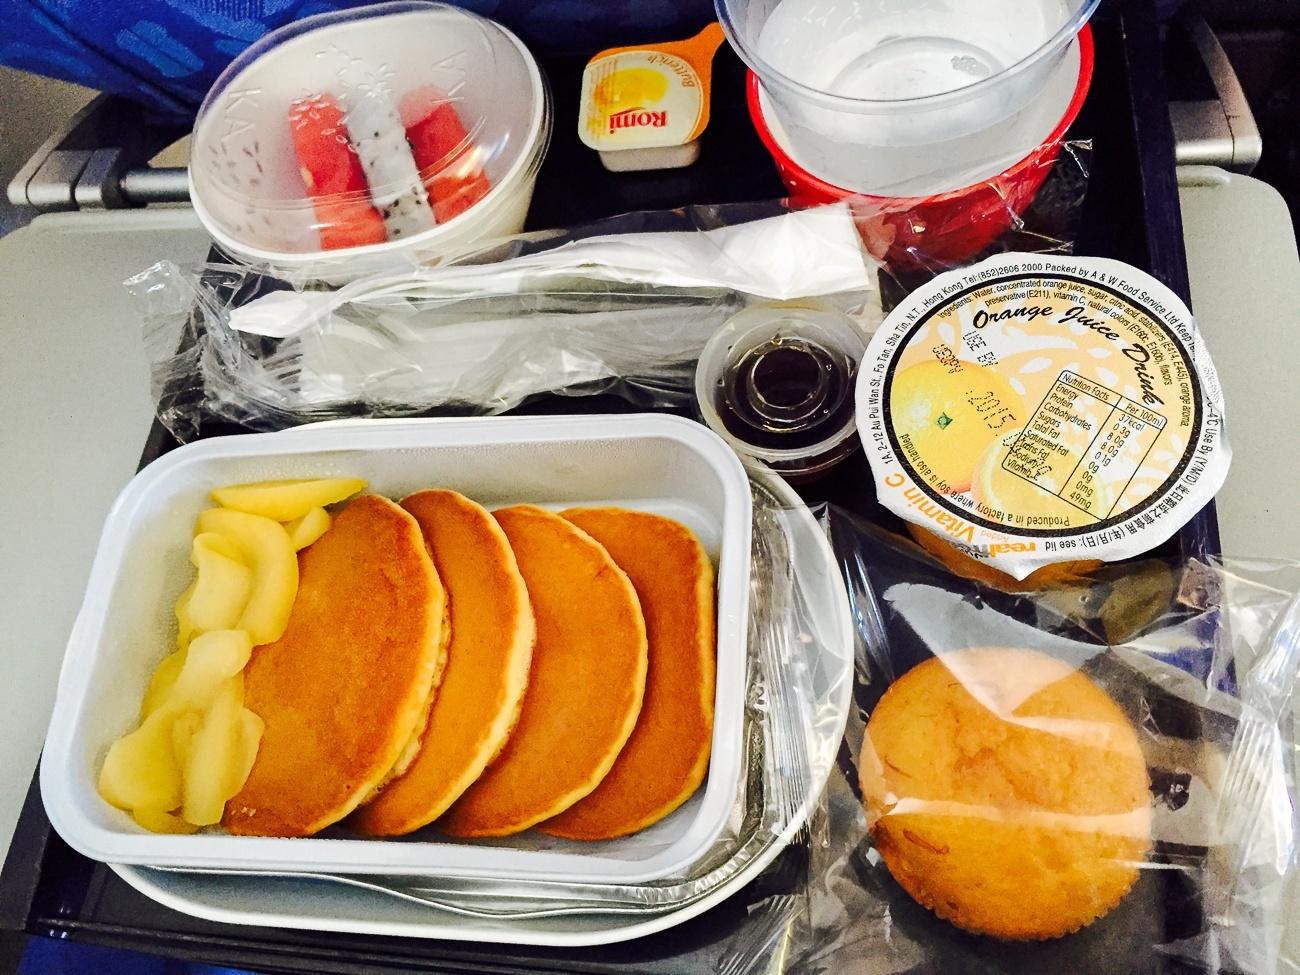 6664883216fb A children s meal on a Dragonair short haul flight between Hong Kong and  Kota Kinabalu